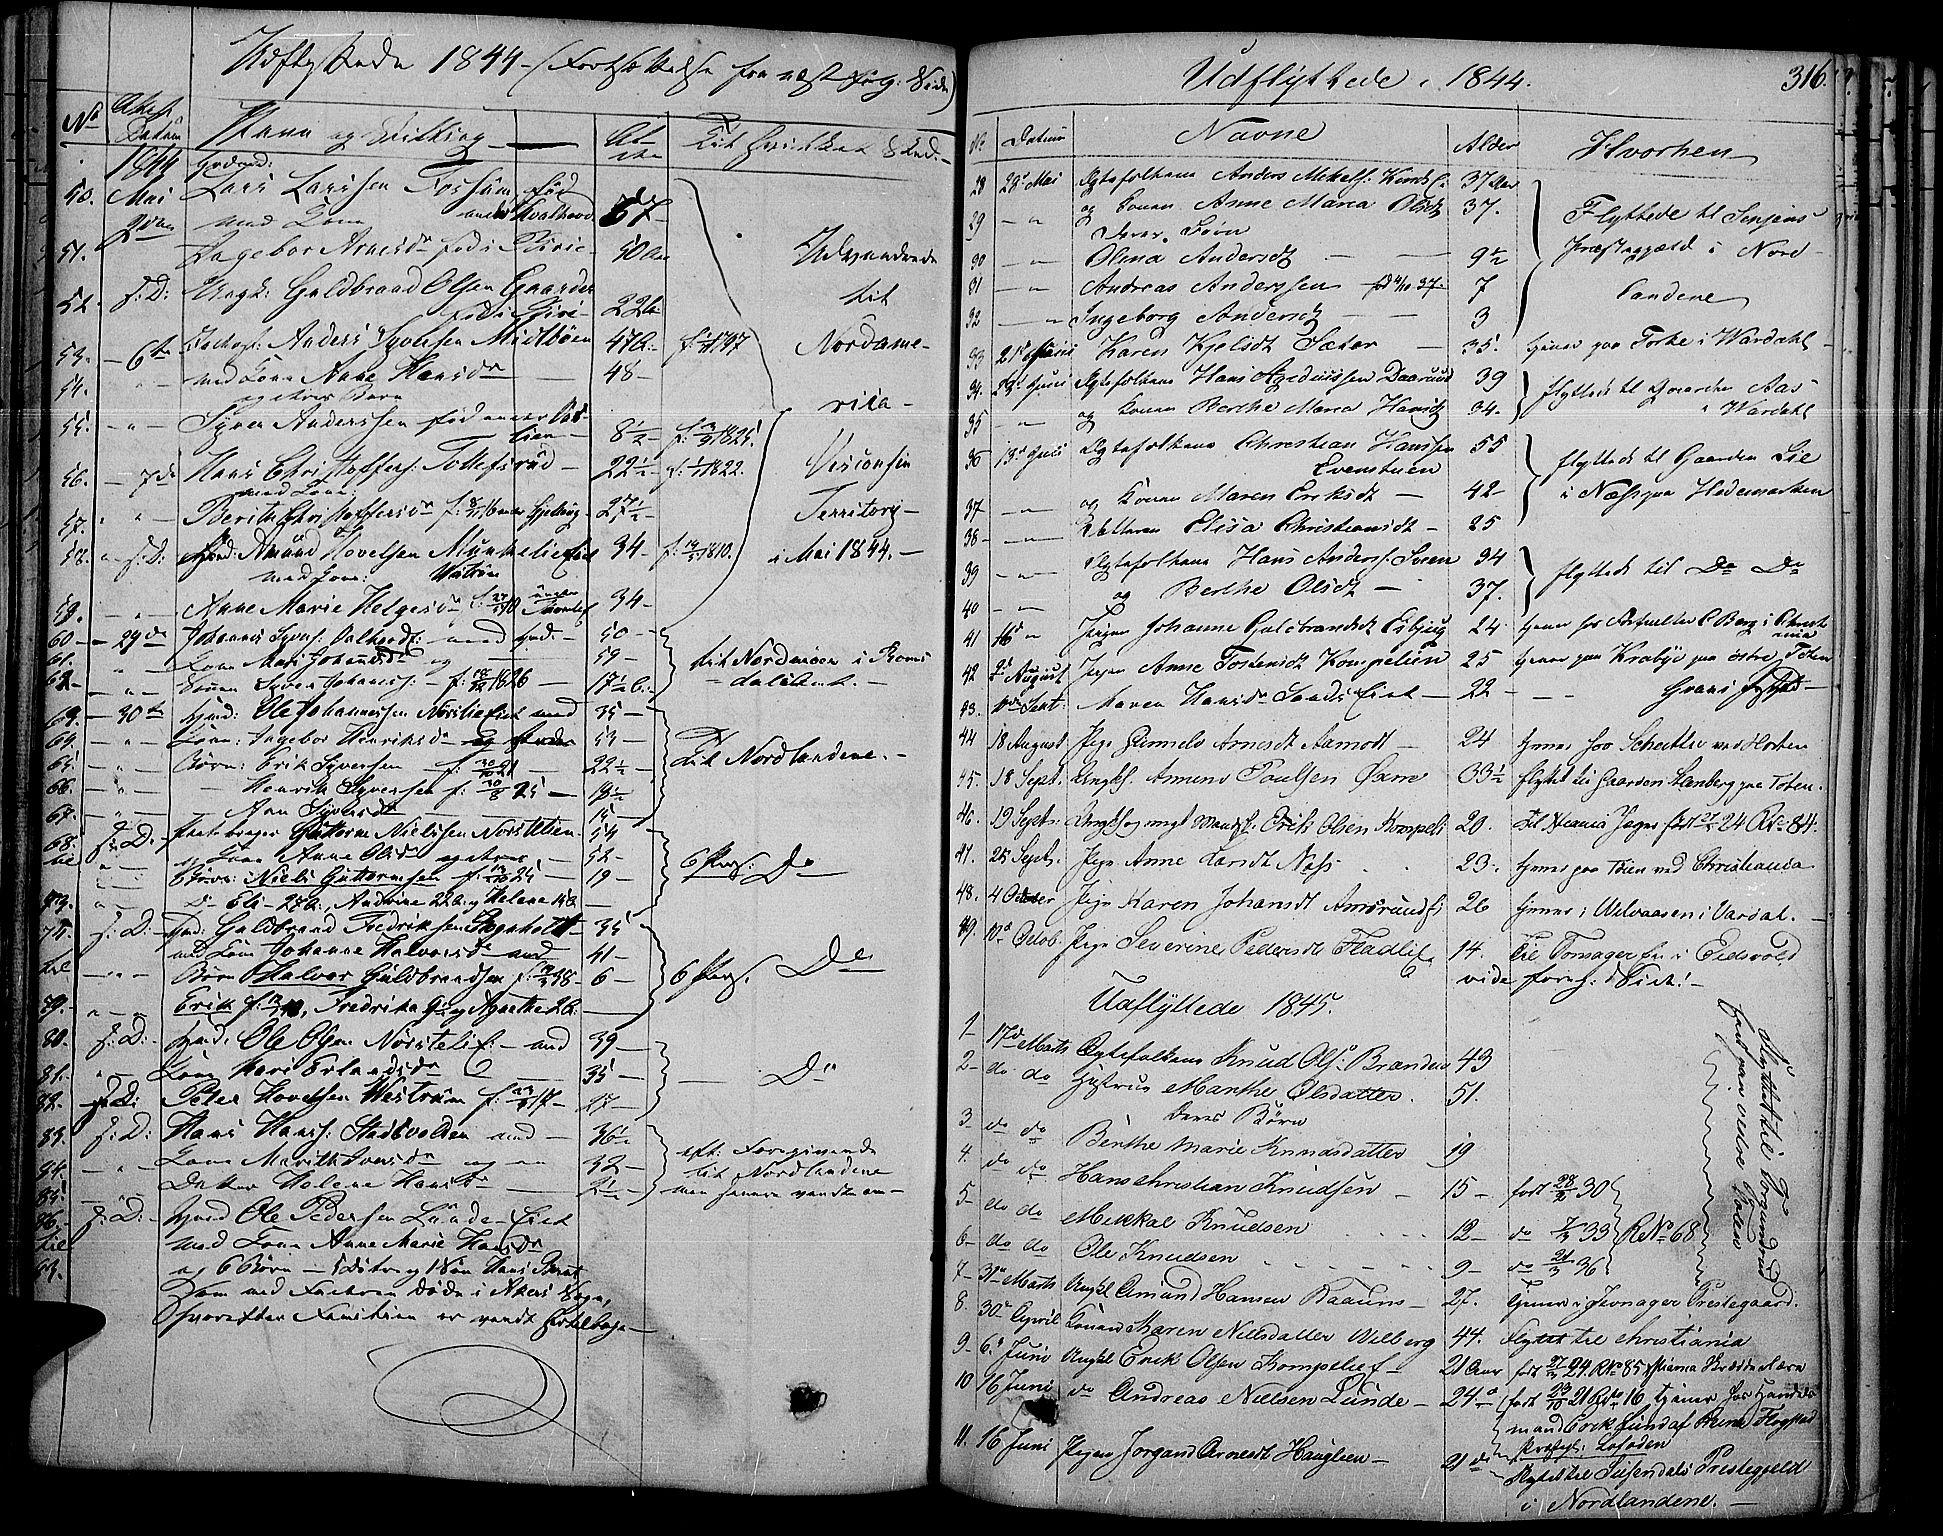 SAH, Land prestekontor, Ministerialbok nr. 8, 1830-1846, s. 316